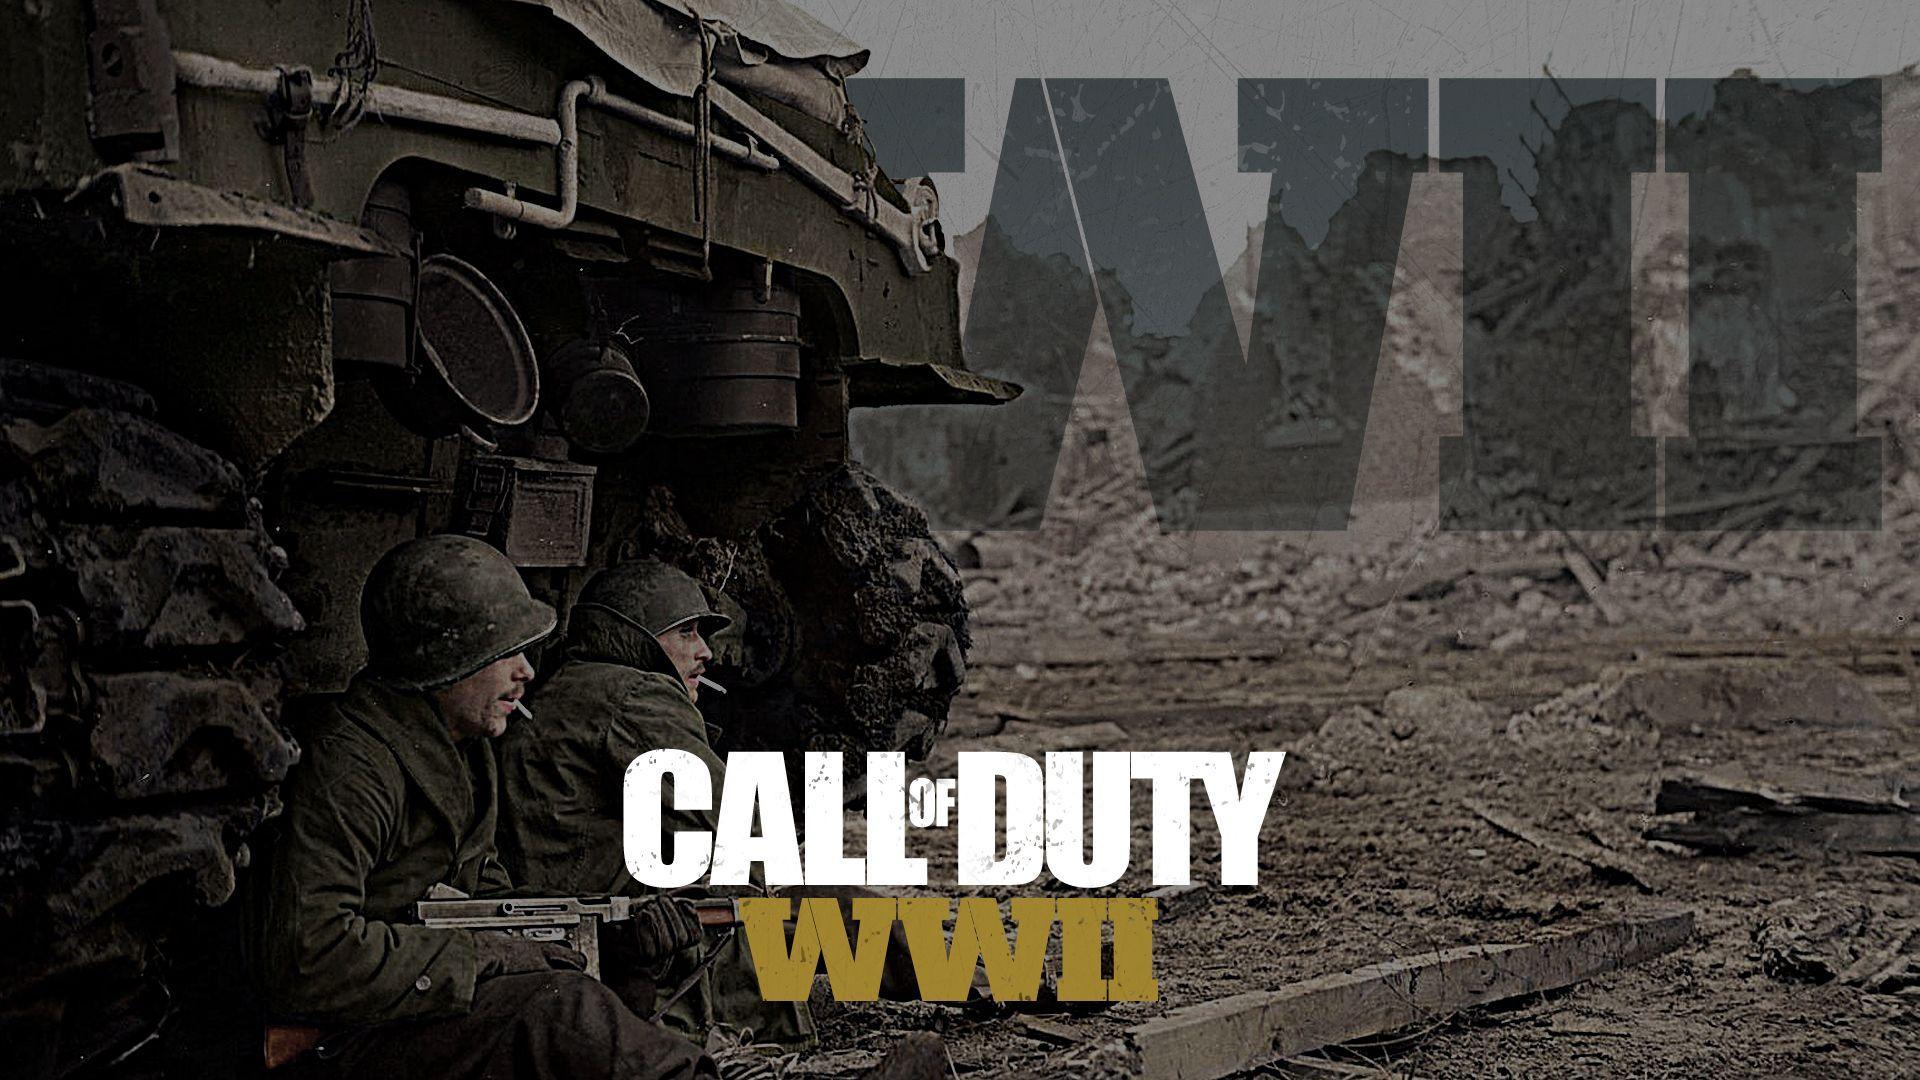 Call Of Duty Ww2 Wallpaper: COD WW2 Wallpapers